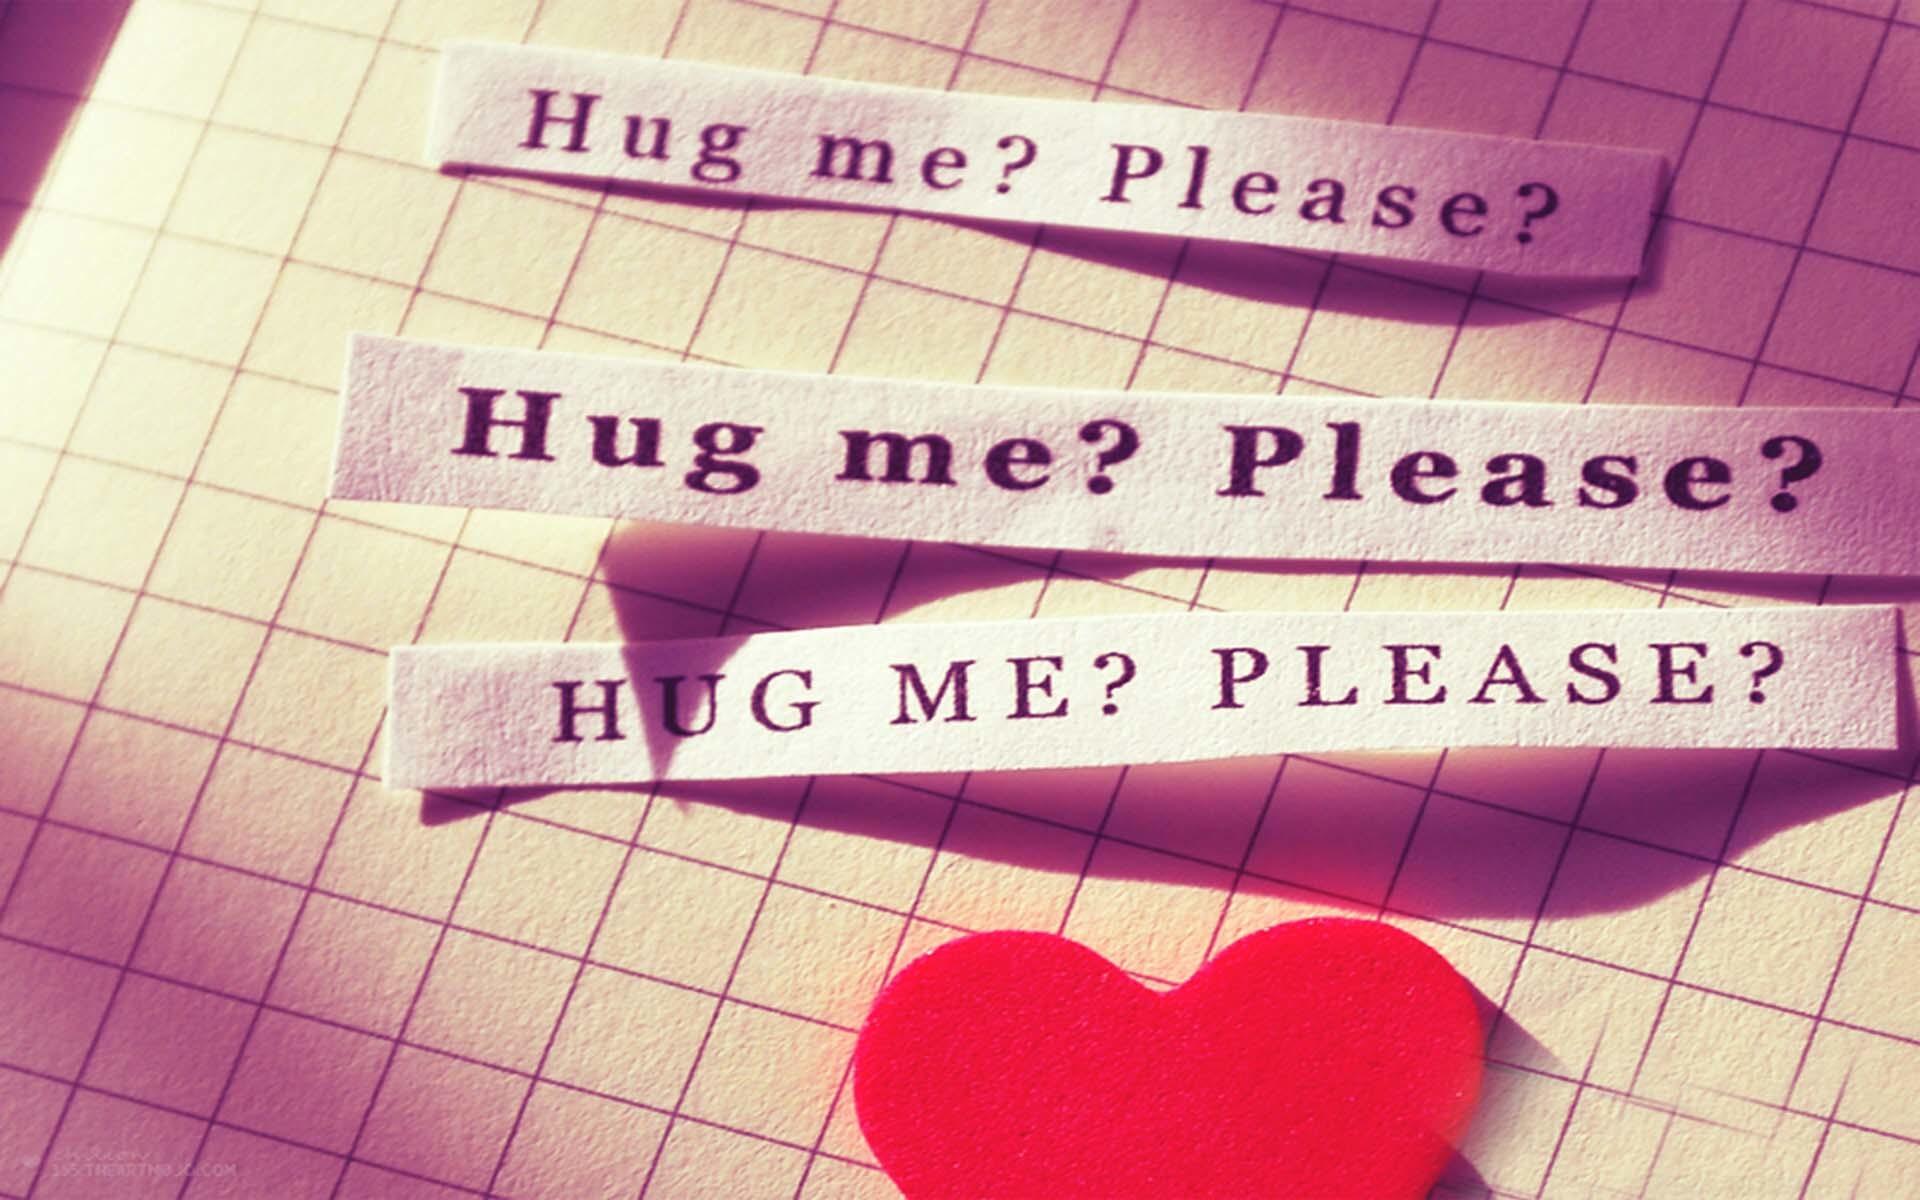 Hugs Wallpapers Group 500×500 Hug Images Wallpapers (54 Wallpapers) |  Adorable Wallpapers | Wallpapers | Pinterest | Lovers hug and Wallpaper